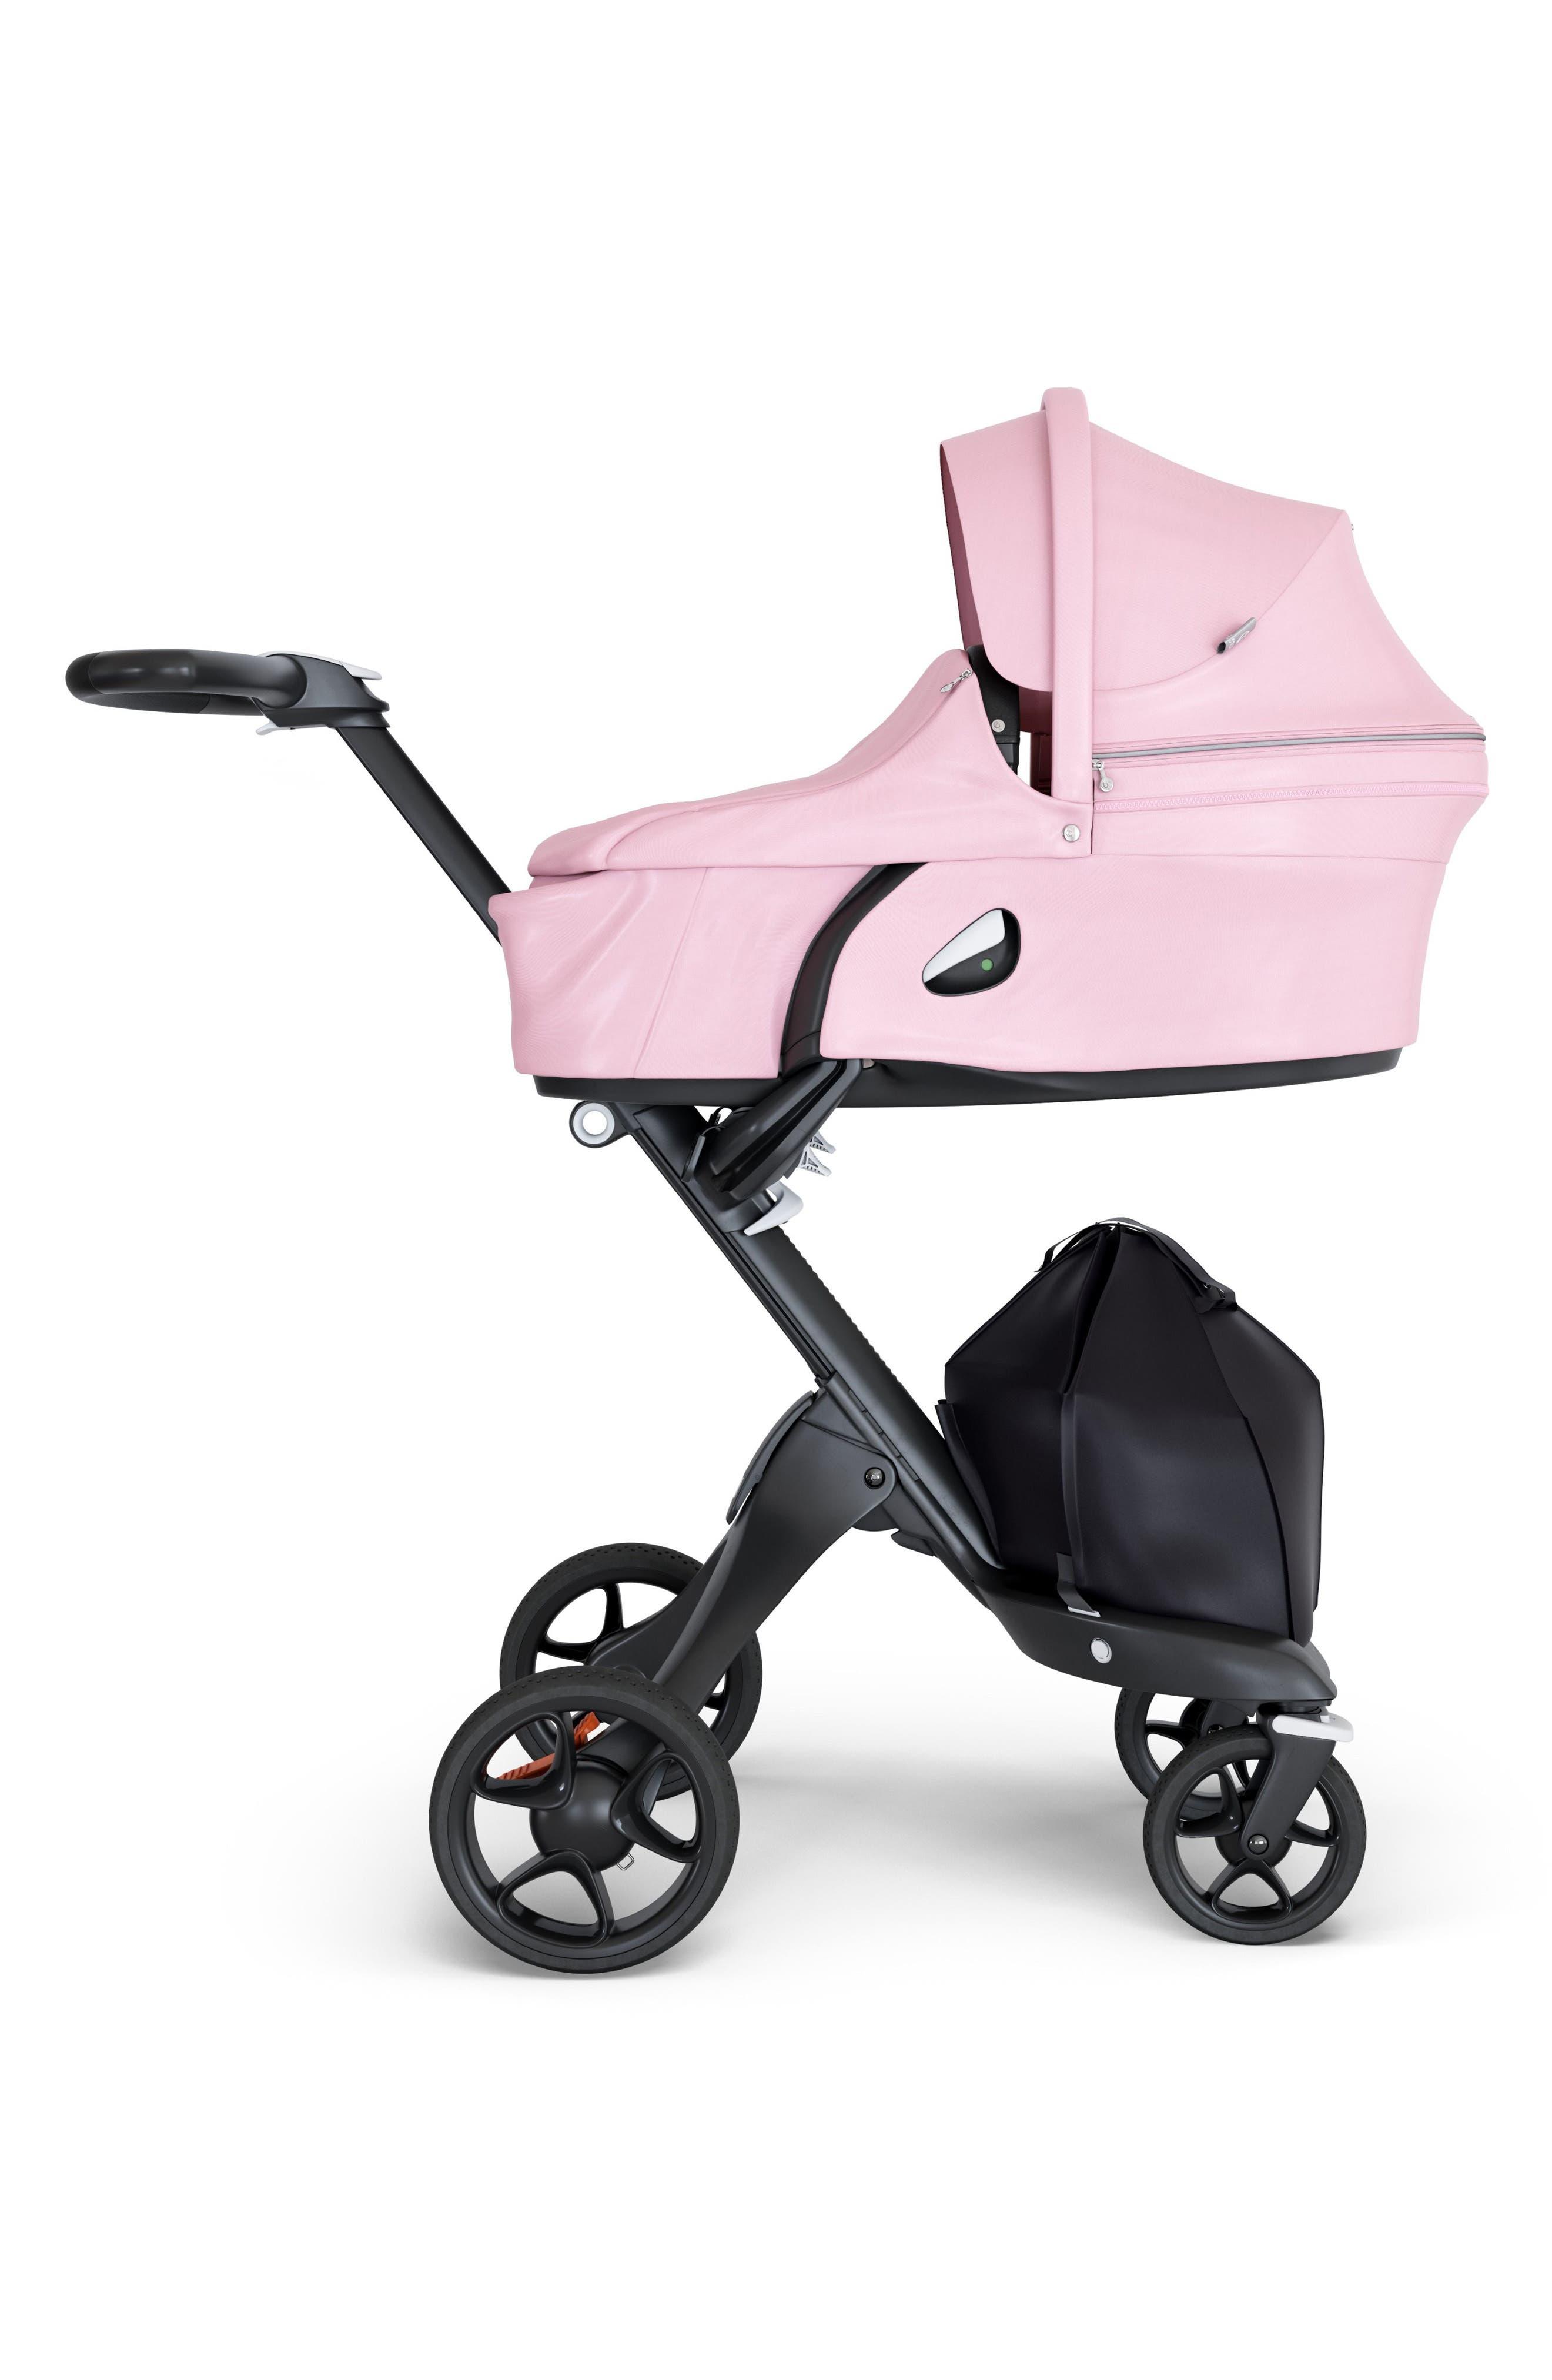 Stokke Xplory® Carry Cot Attachment